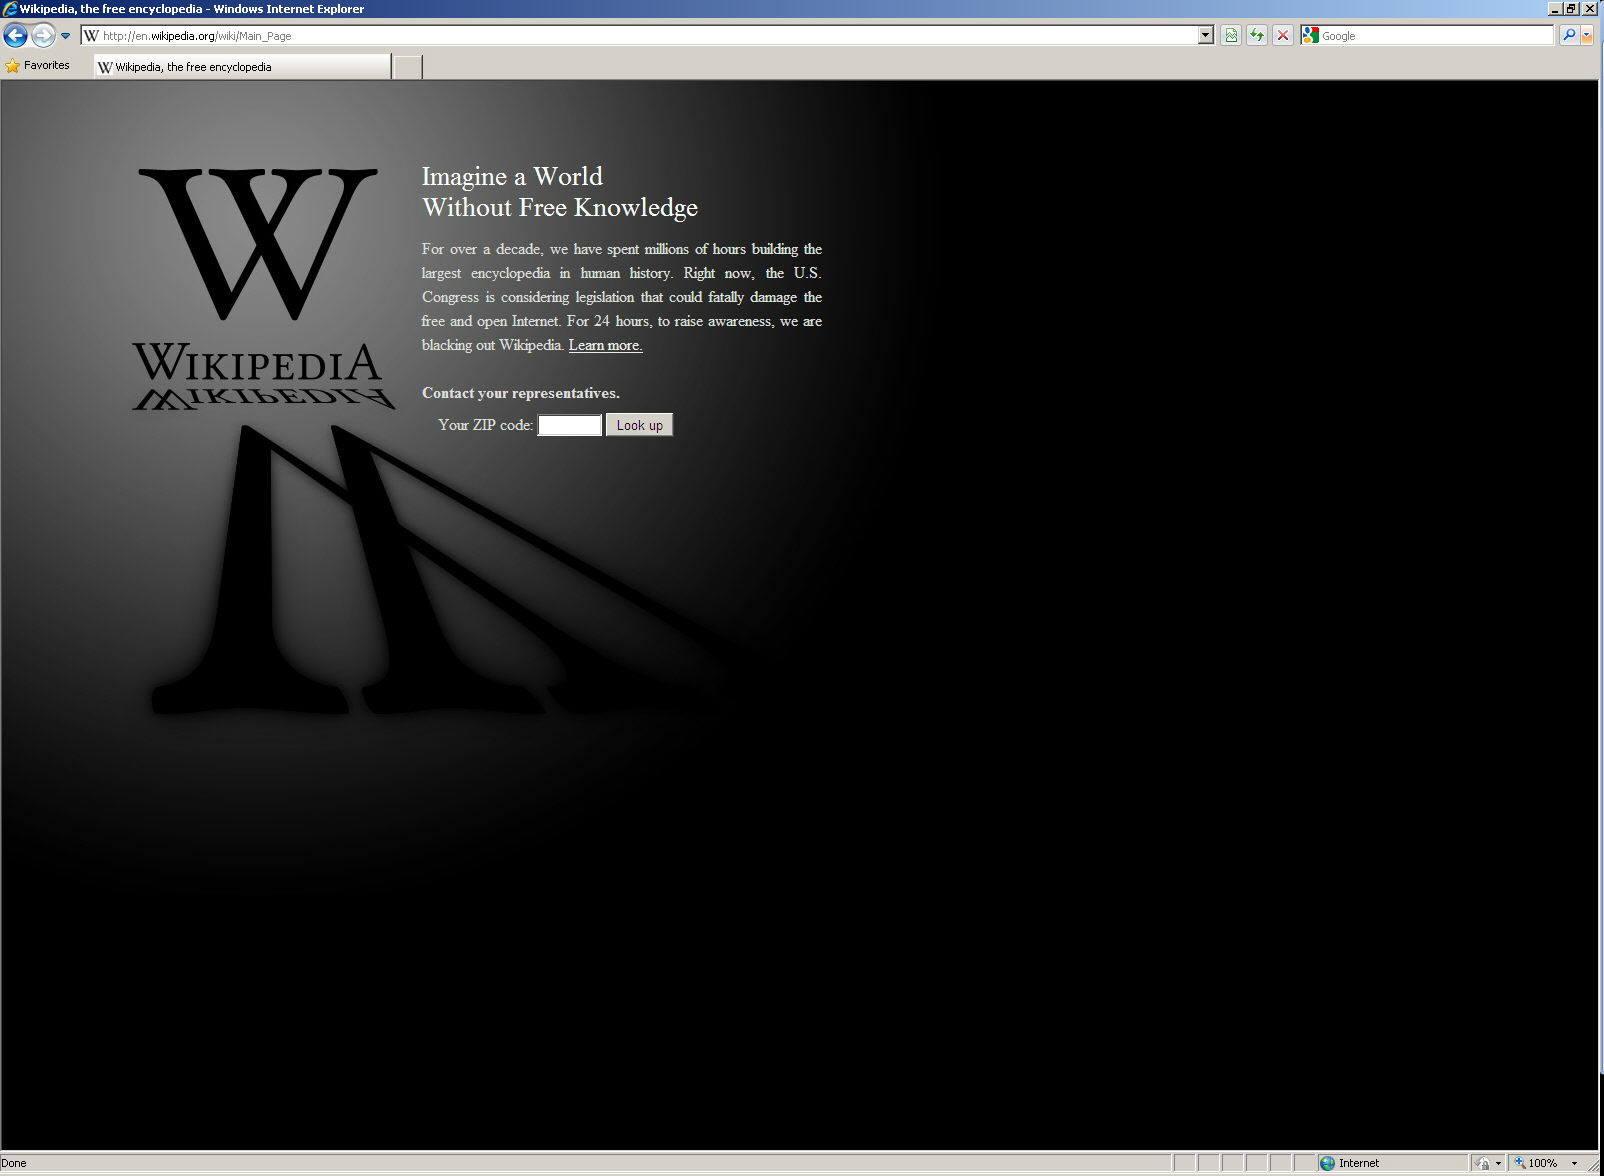 Apagón digital anti SOPA